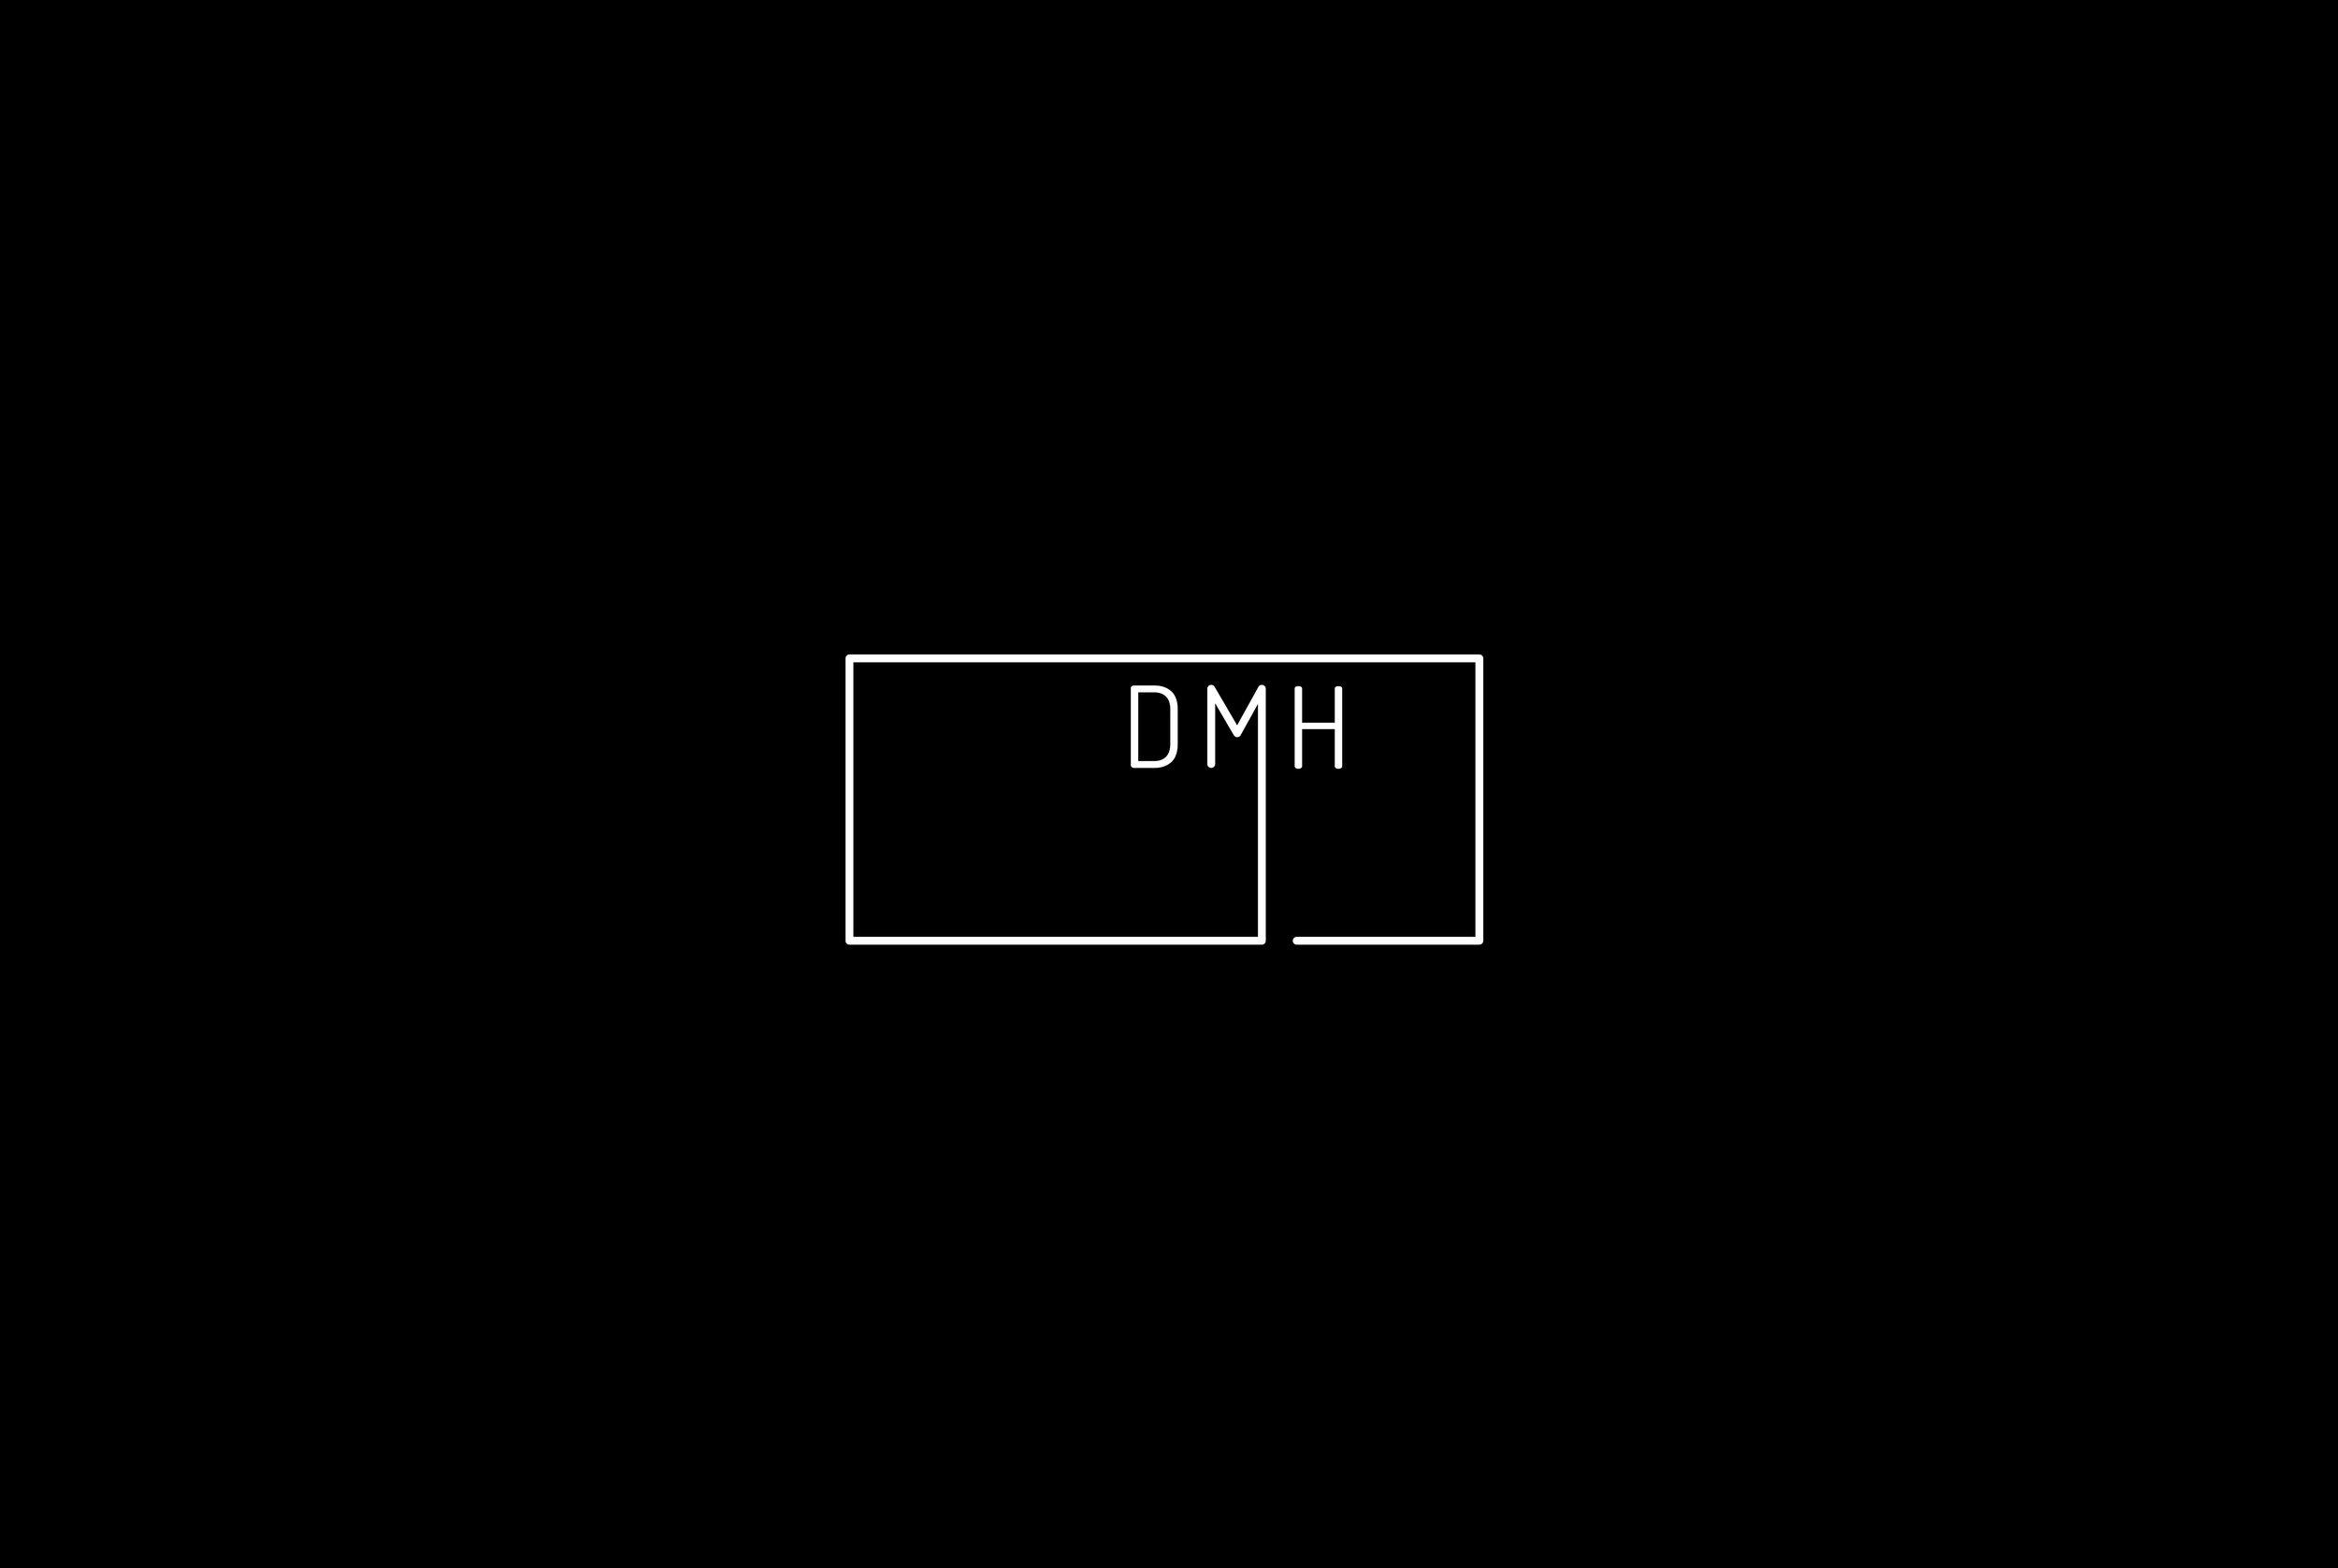 DMH_IDENT 002.jpg